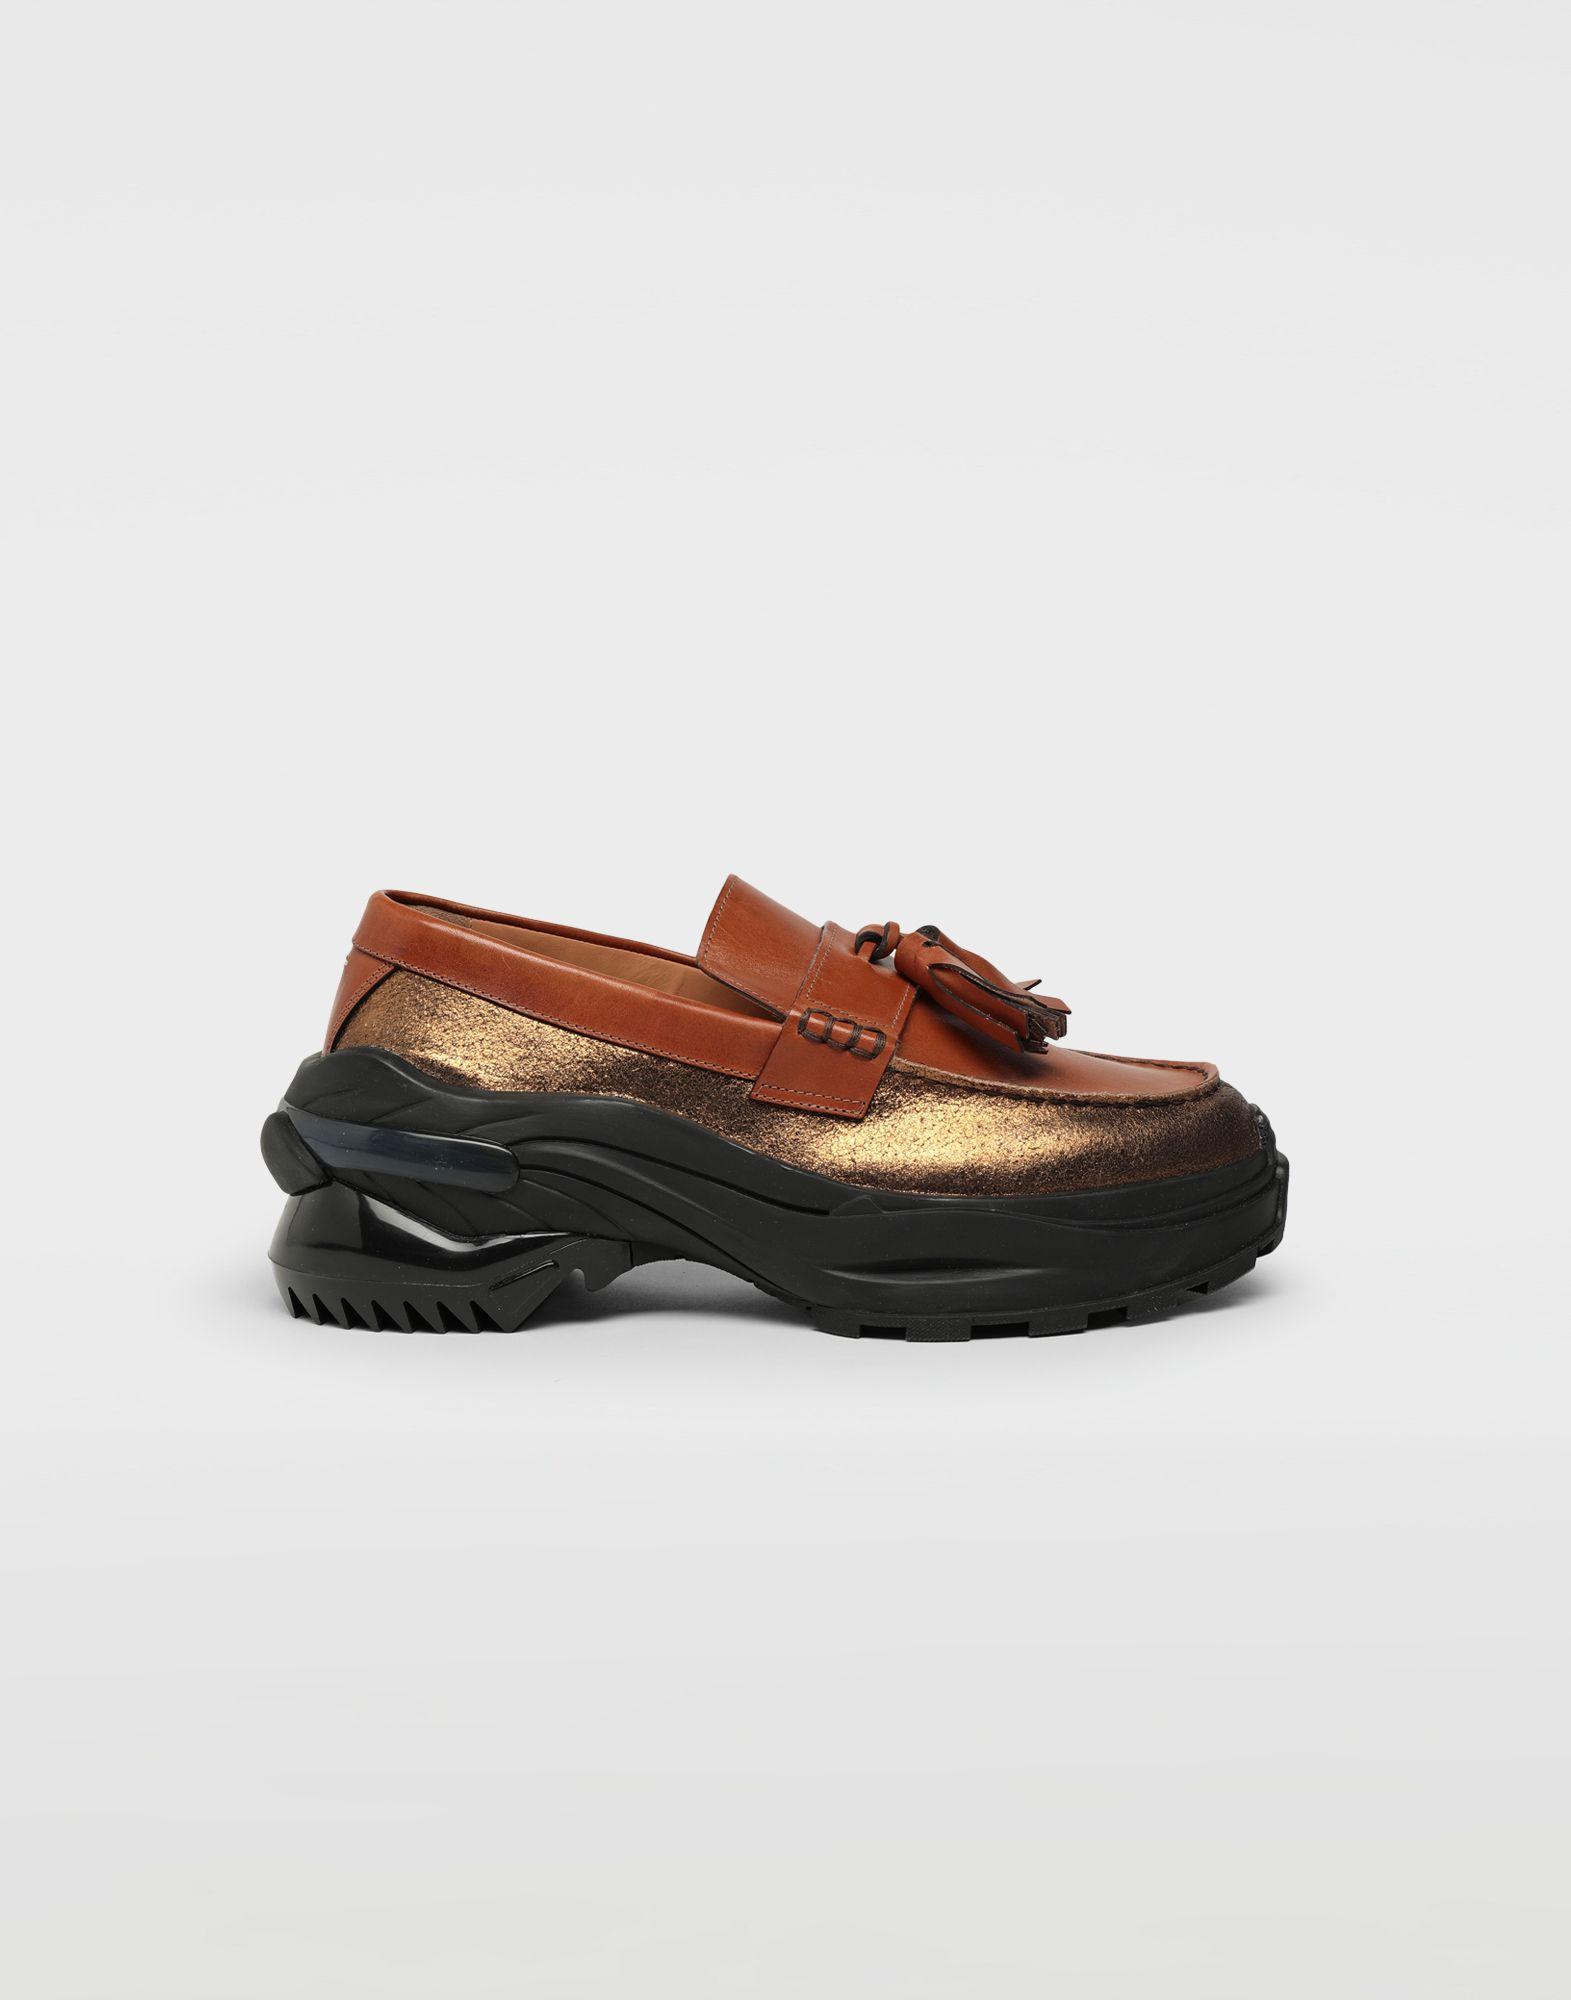 MAISON MARGIELA Gespleißte Sneakers mit Tasselloafer Mokassins Herren f